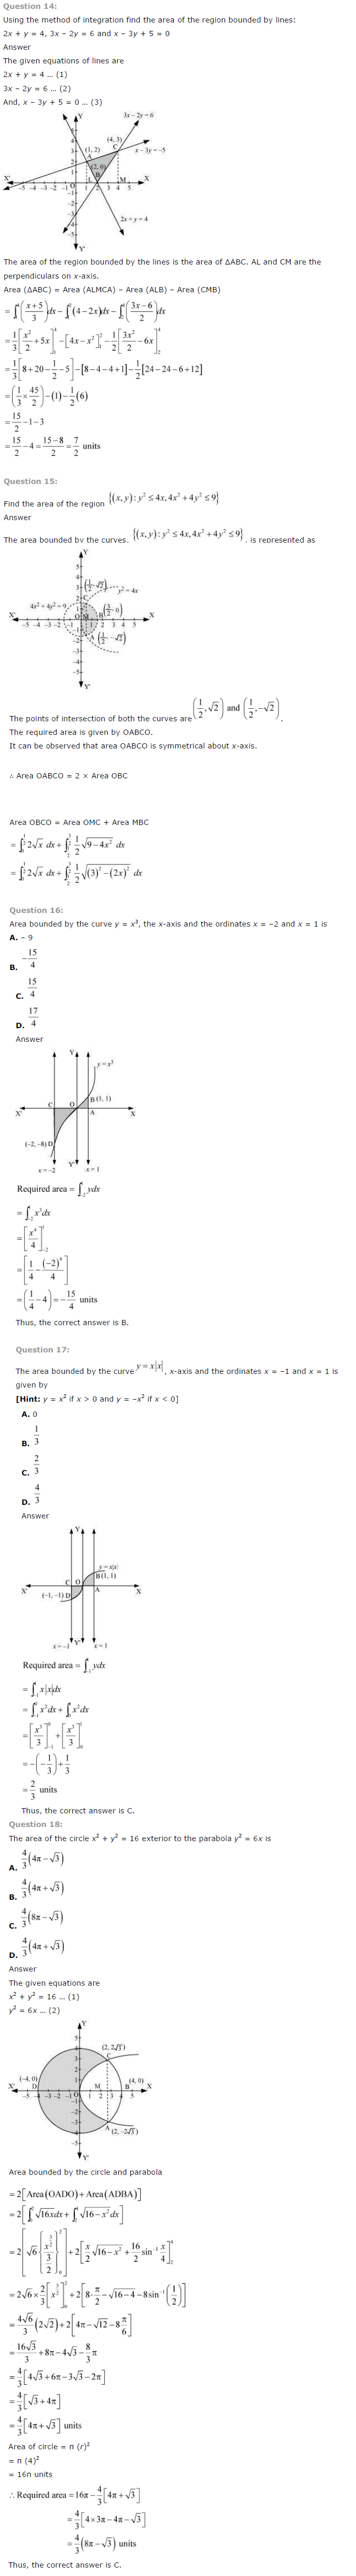 NCERT Solutions for Class 12 Maths Chapter 8 Application of Integrals ex 8.7